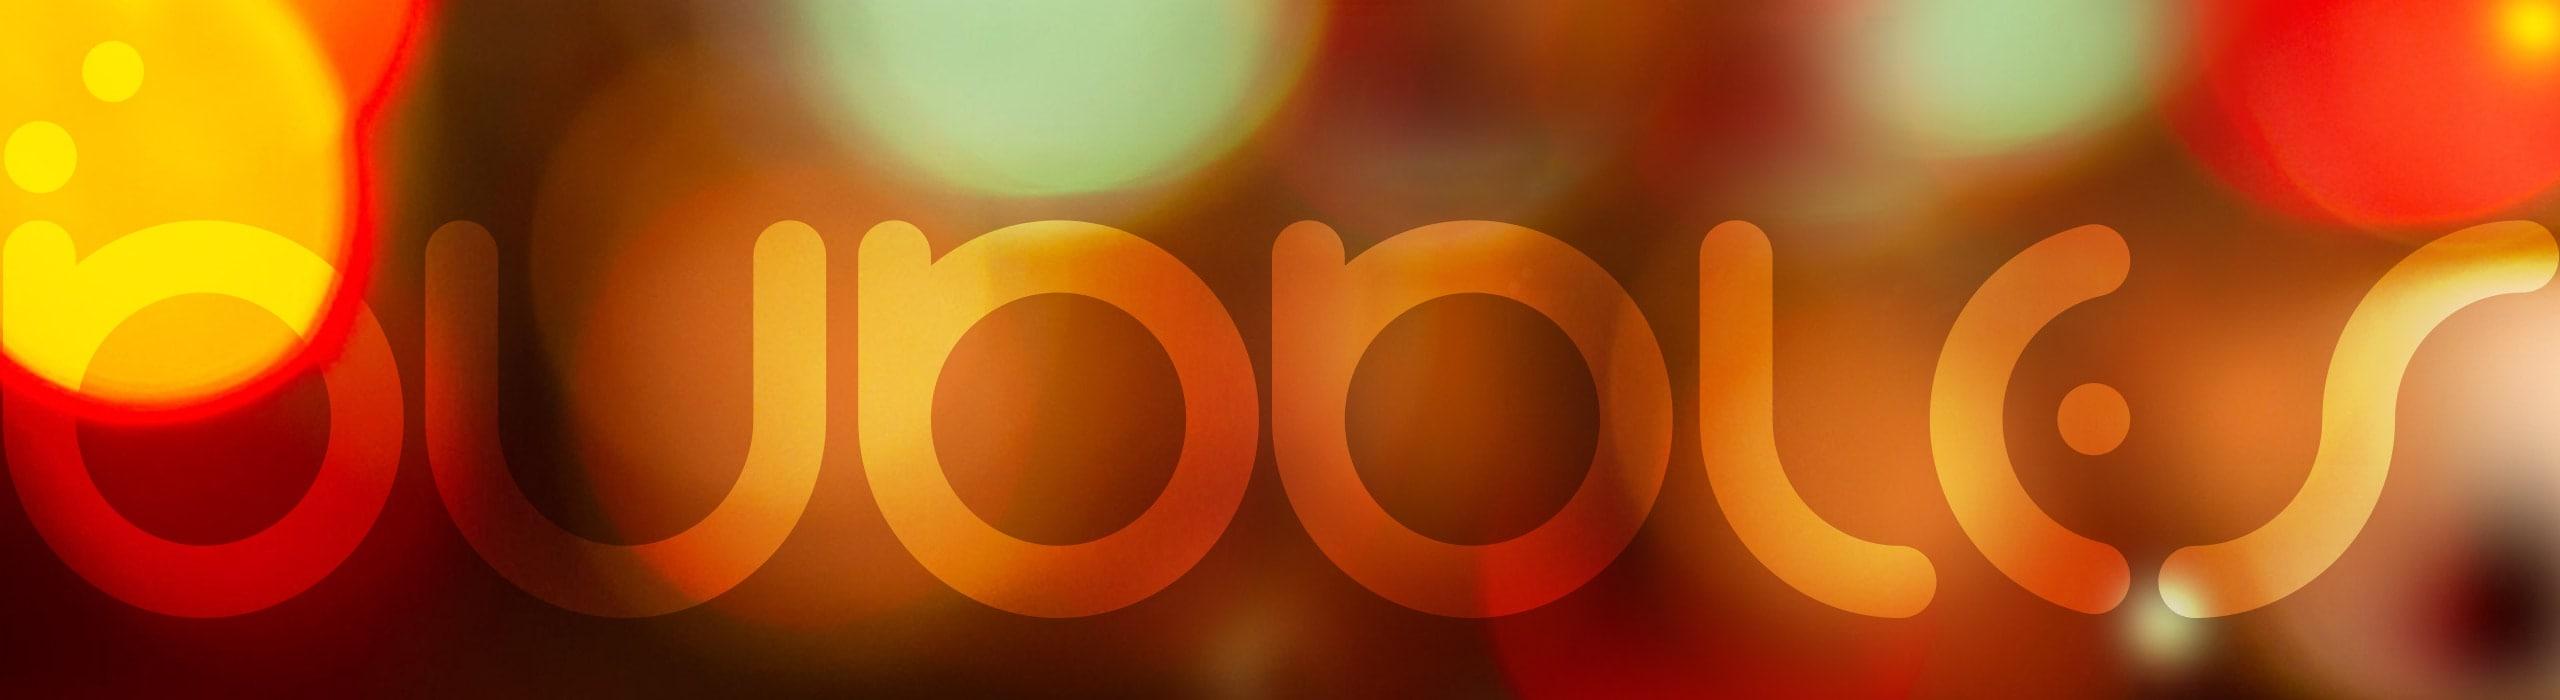 Bubbles - natie-bubbles-banner - Natie Branding Agency